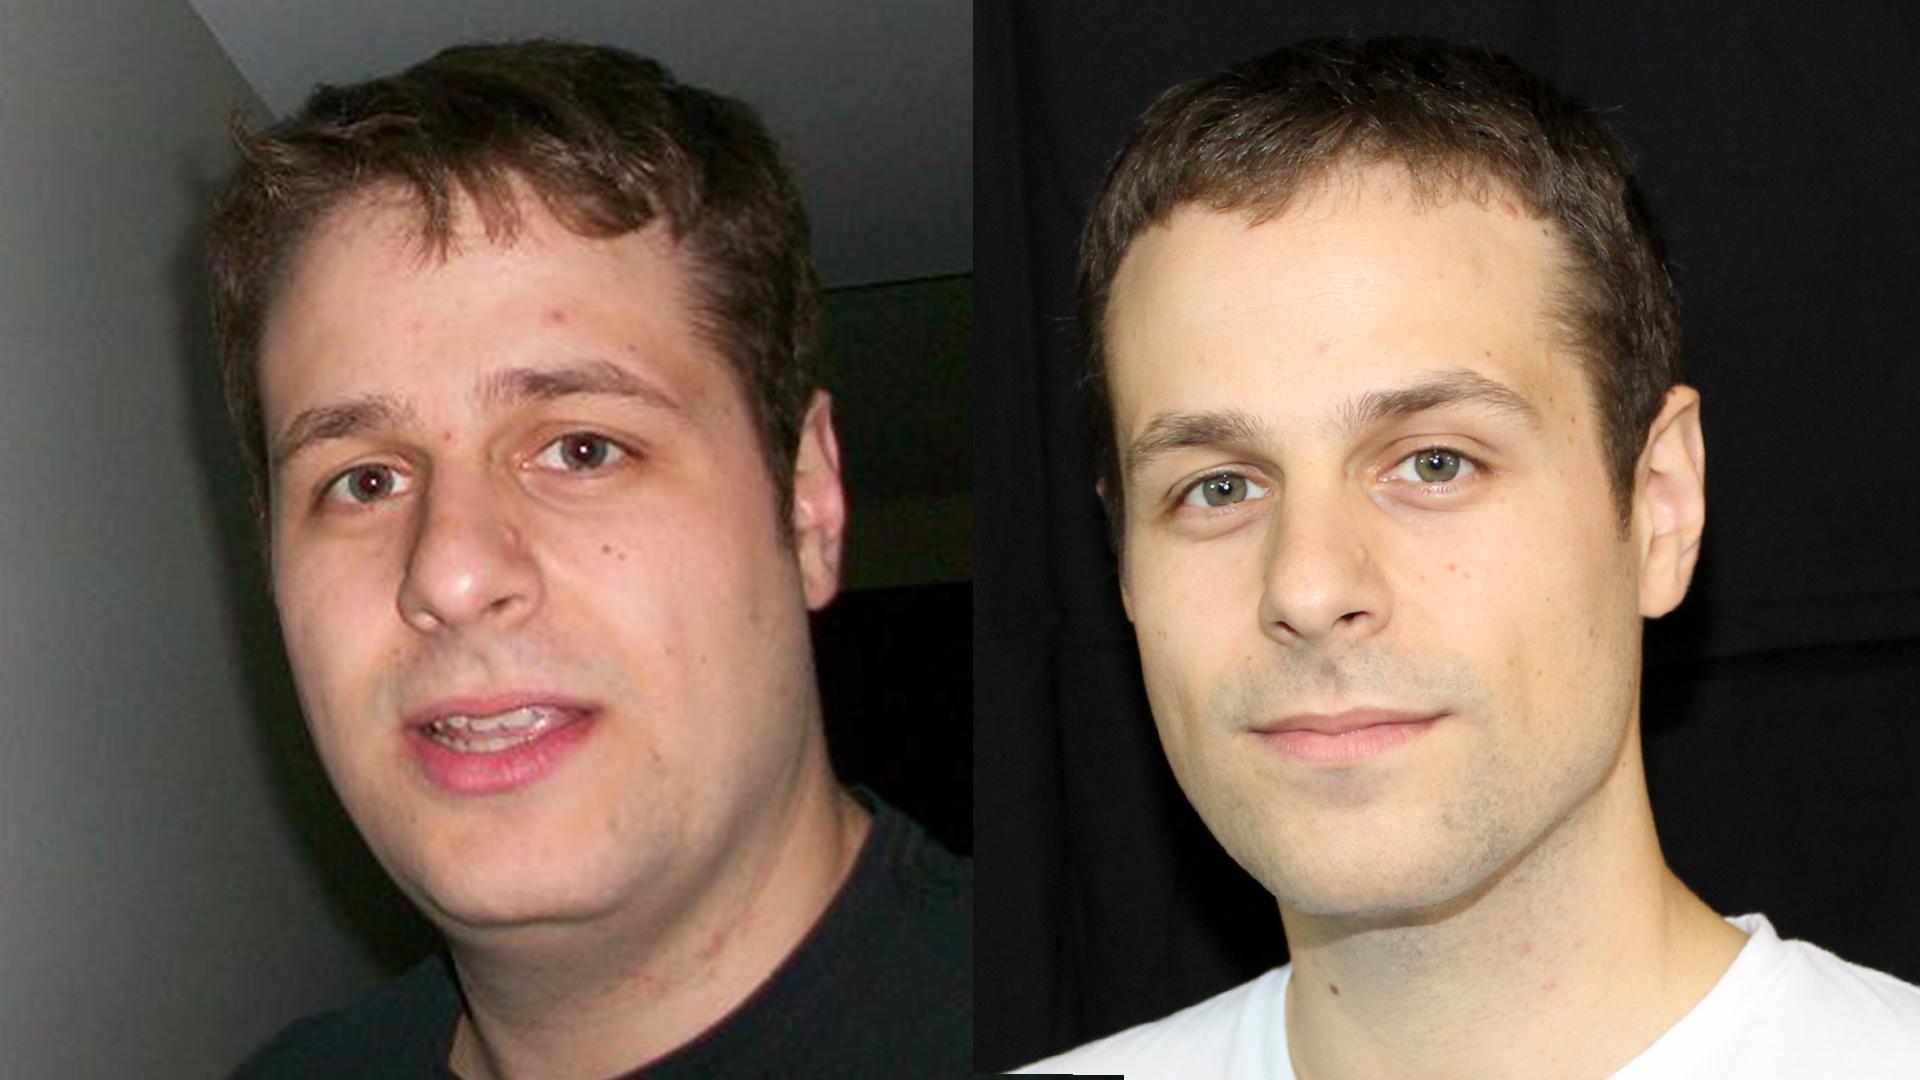 Progress Pics of 60 lbs Weight Loss 5'9 Male 235 lbs to 175 lbs